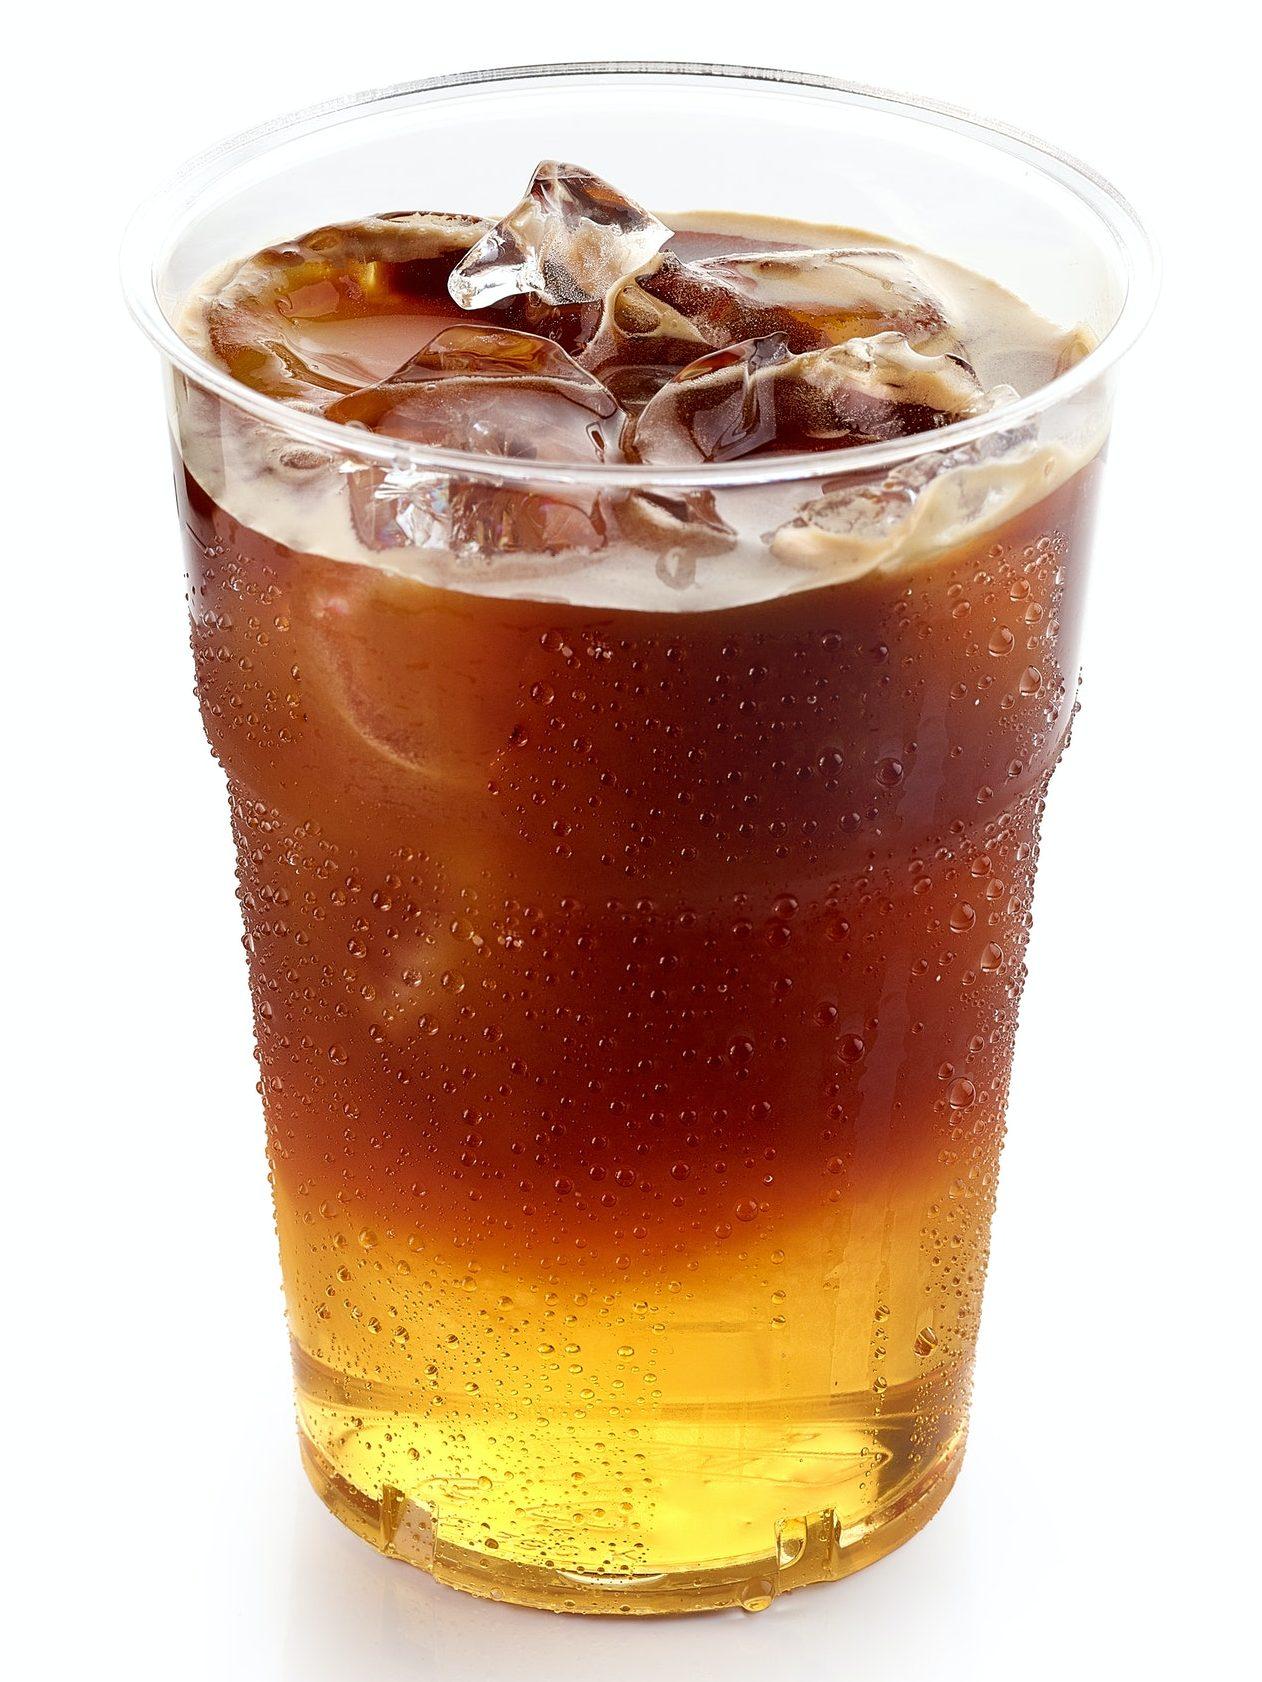 iced layered coffee drink